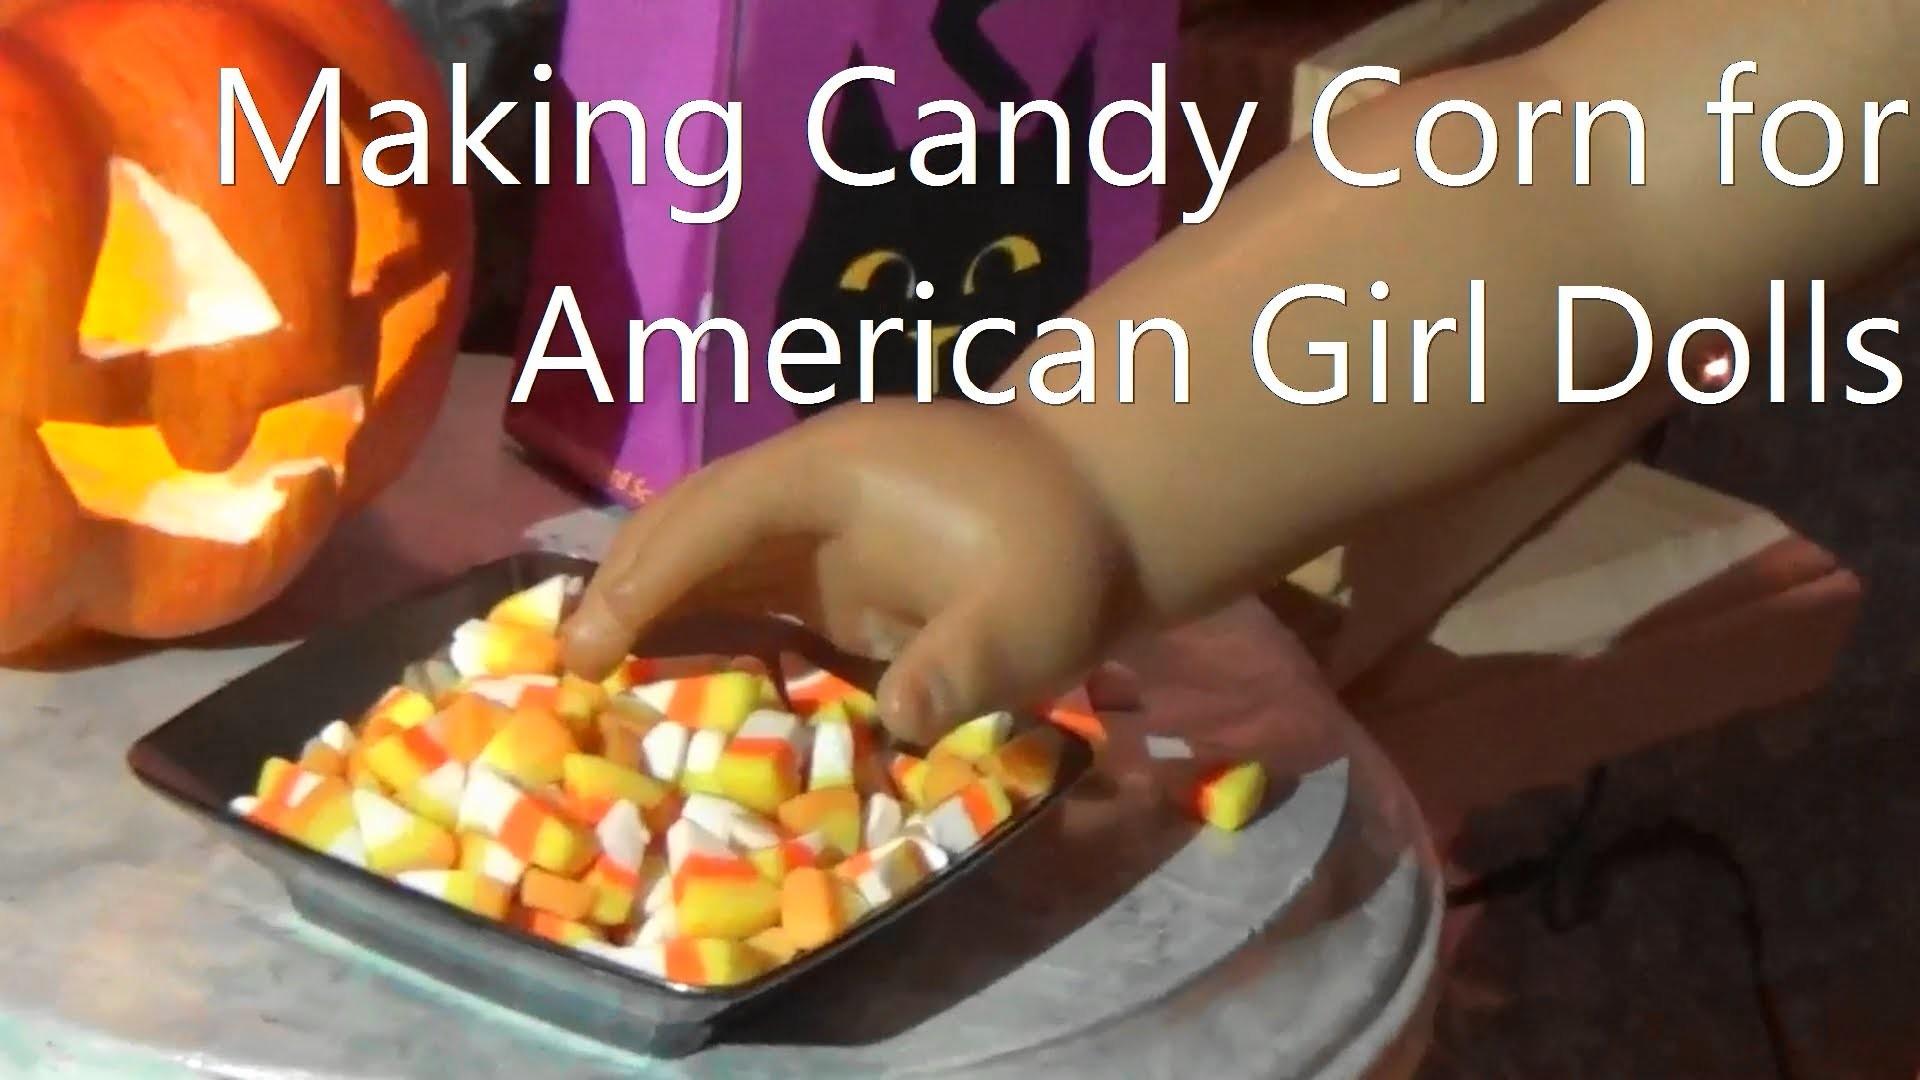 Make Halloween Candy Corn for American Girl Dolls